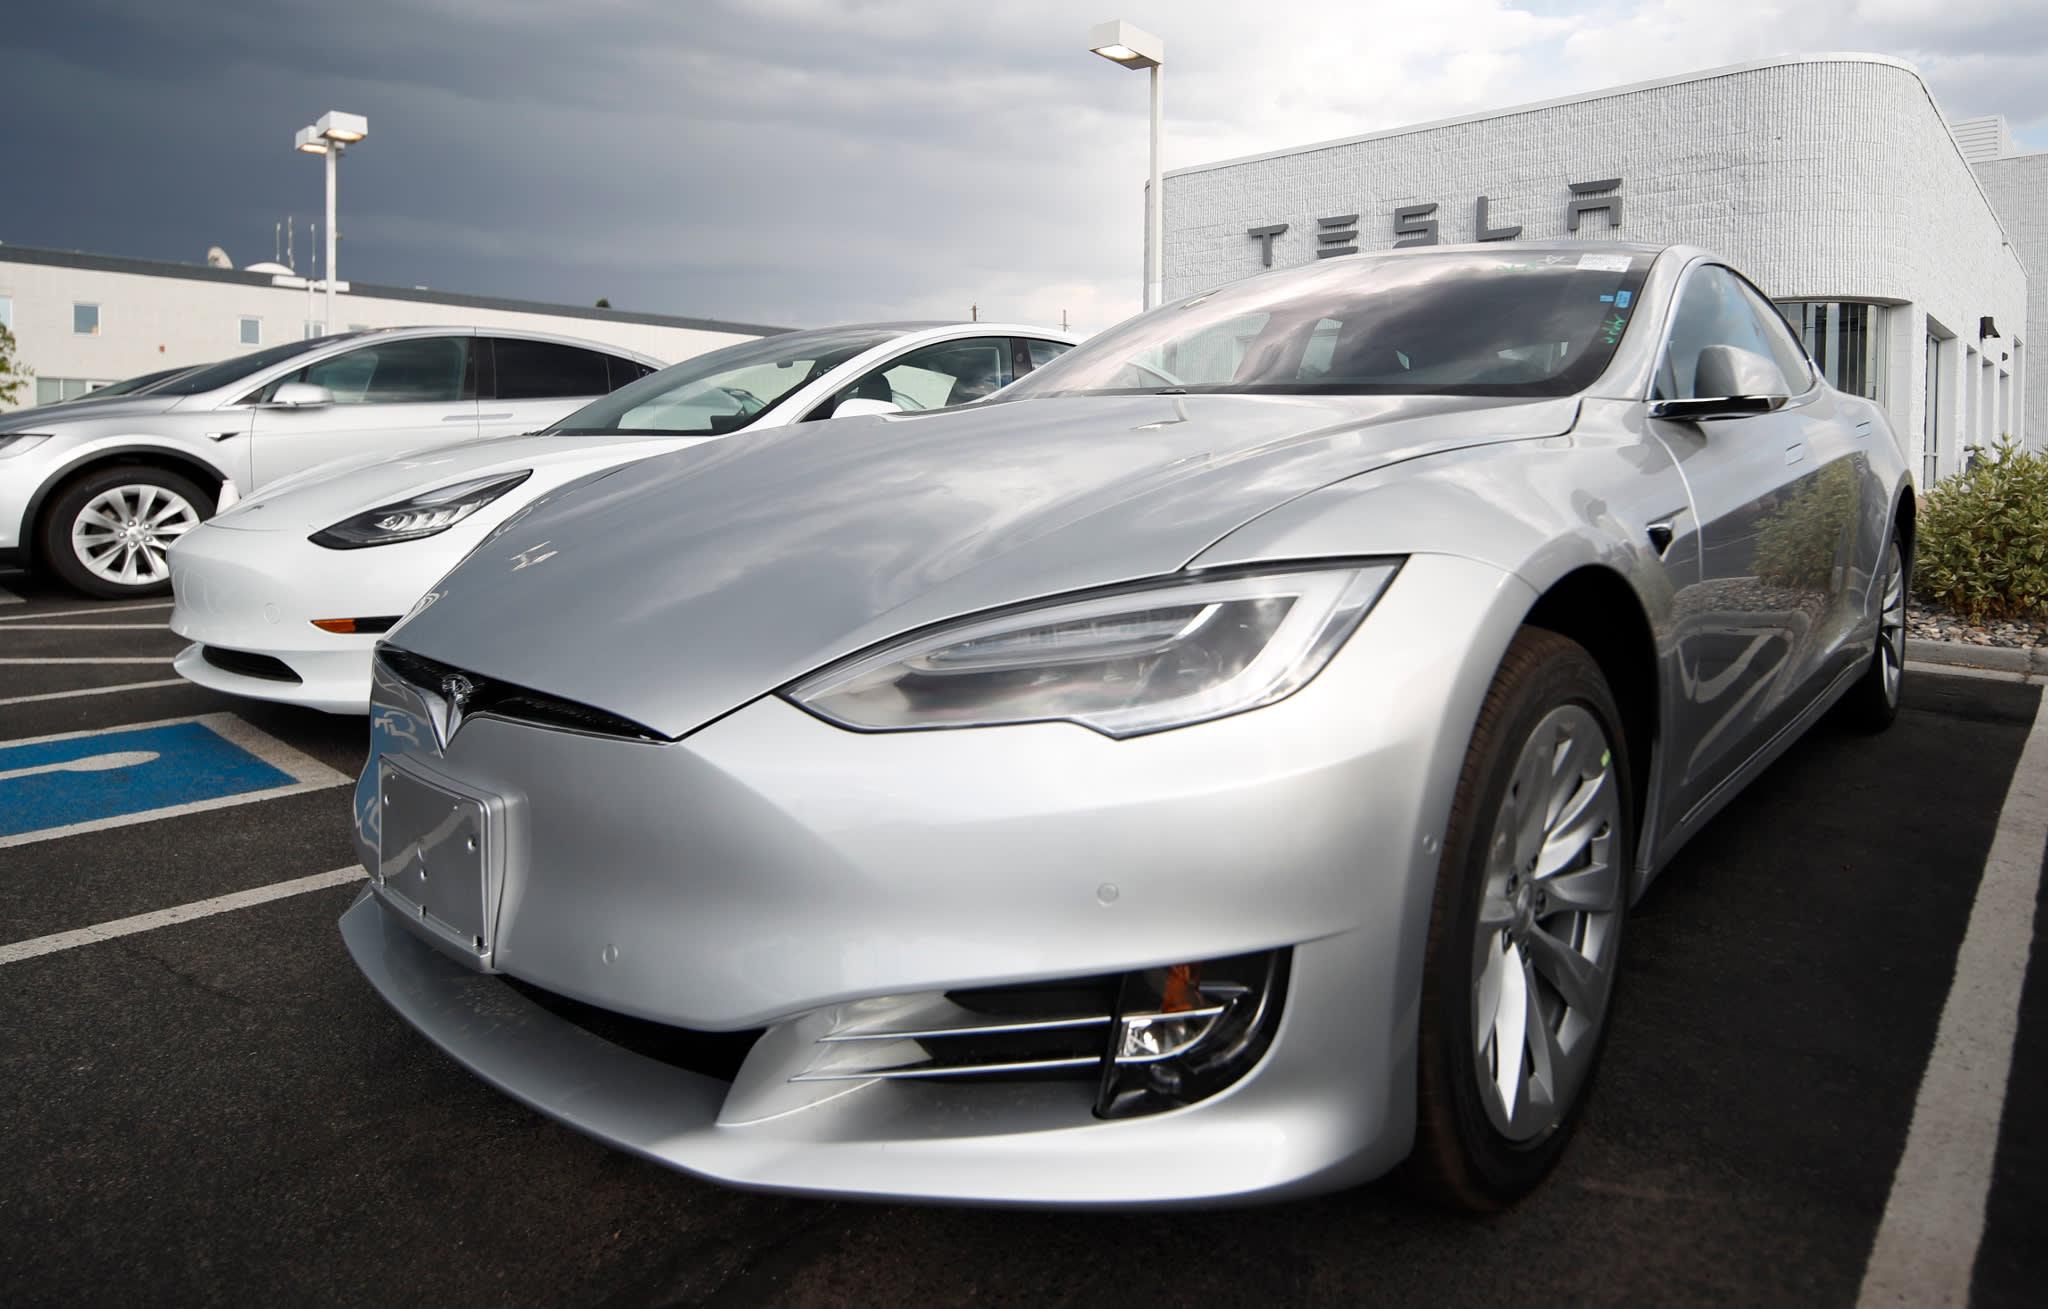 Panasonic profit sinks as Tesla partnership hits speed bump - Nikkei